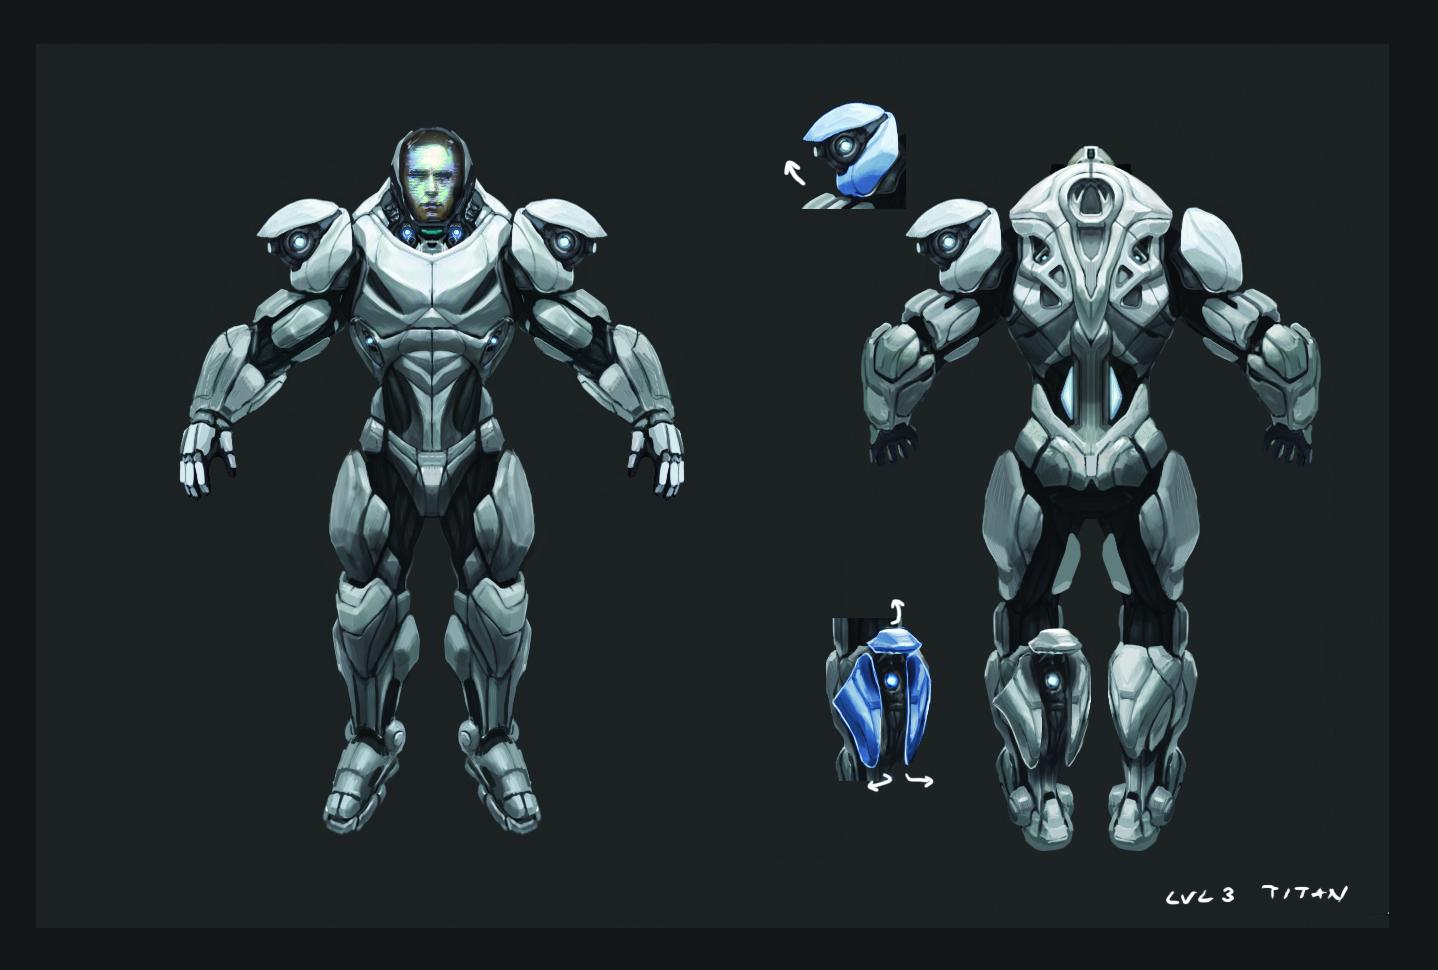 Advanced Power Armor (Fallout) vs Titan Armor (XCOM ...